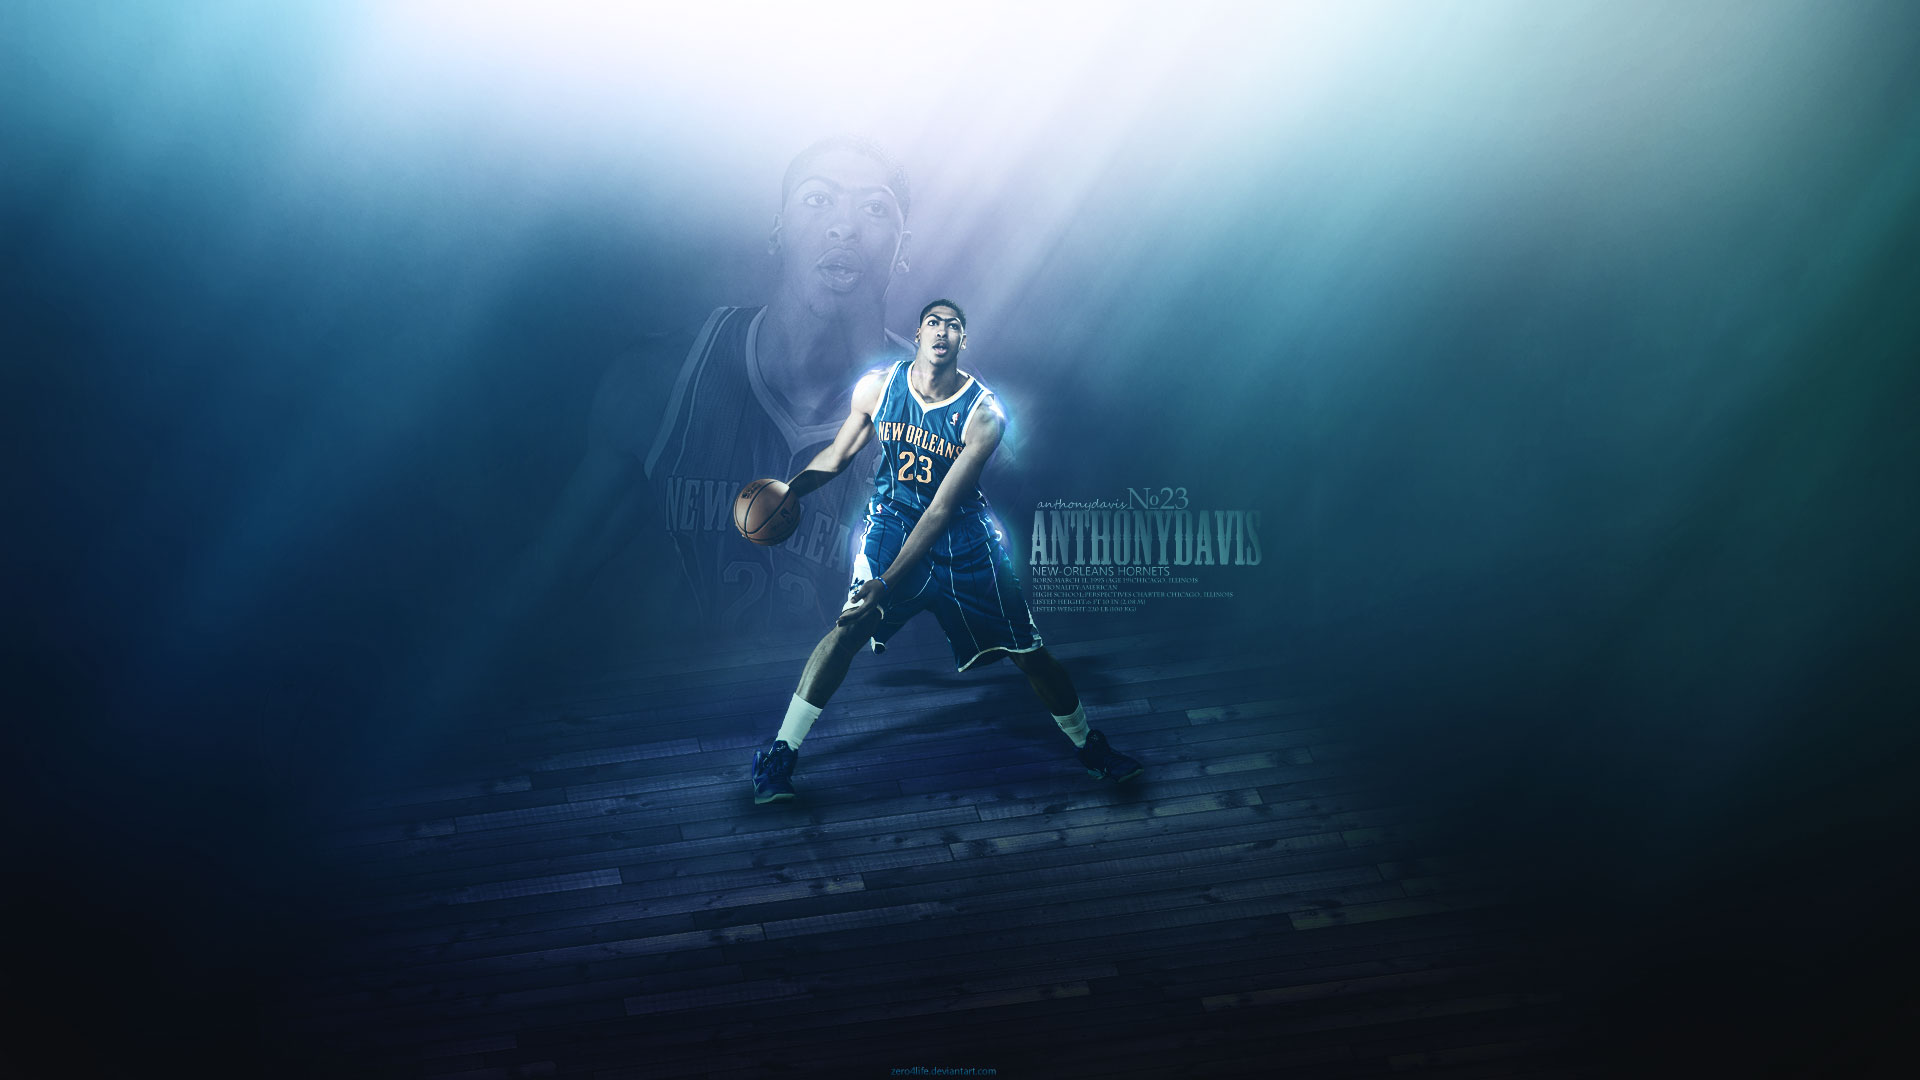 Jamal Crawford Wallpaper Hd New Orleans Hornets Pelicans Nba Basketball 15 Wallpaper